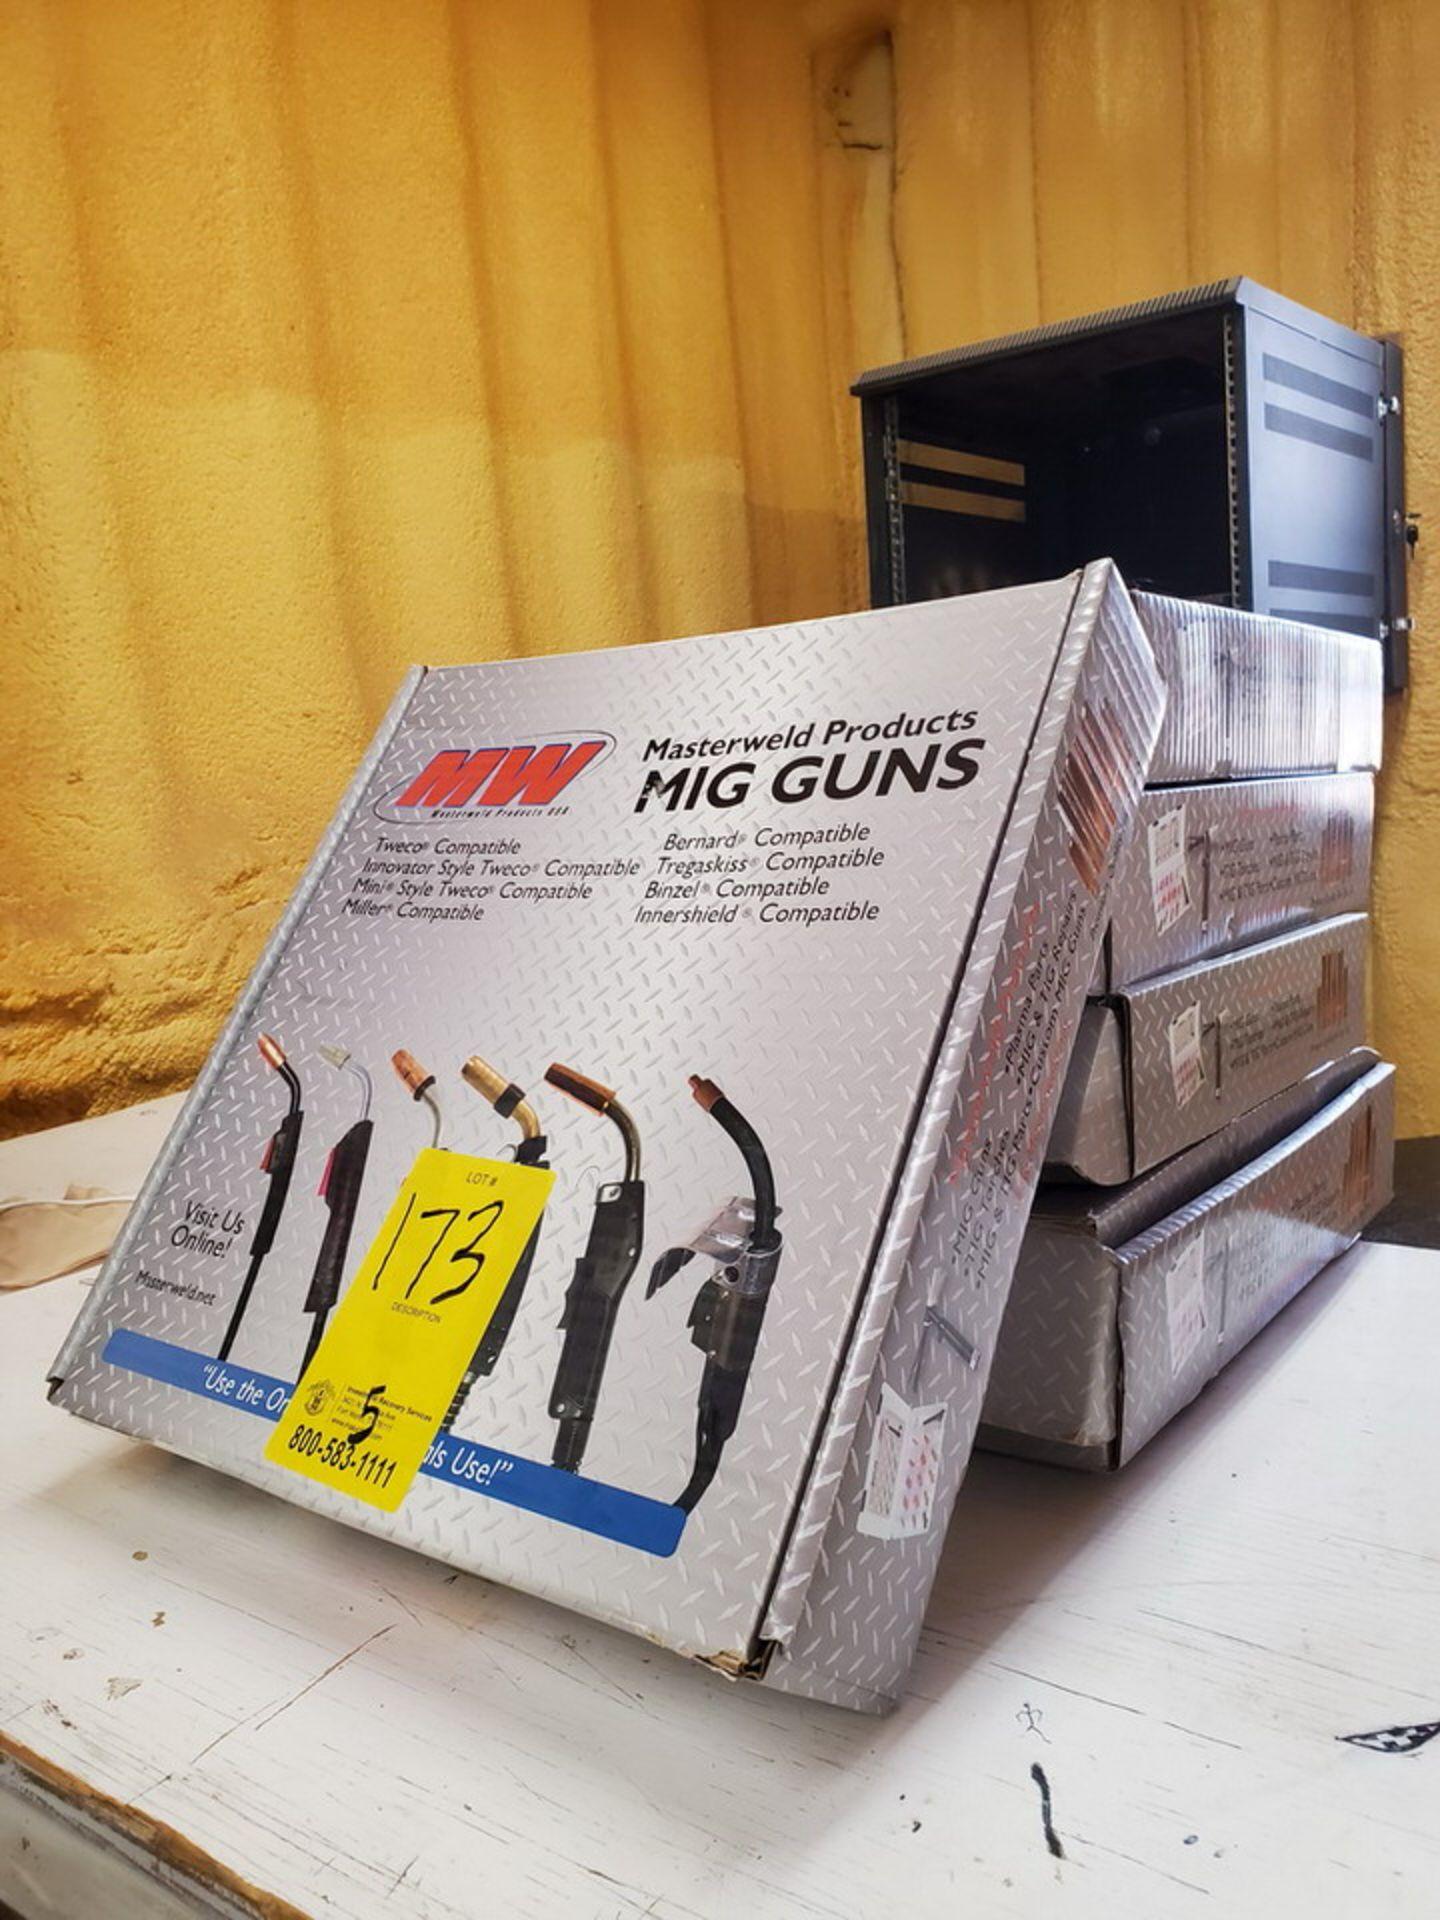 MW (5) Mig Guns - Image 2 of 4